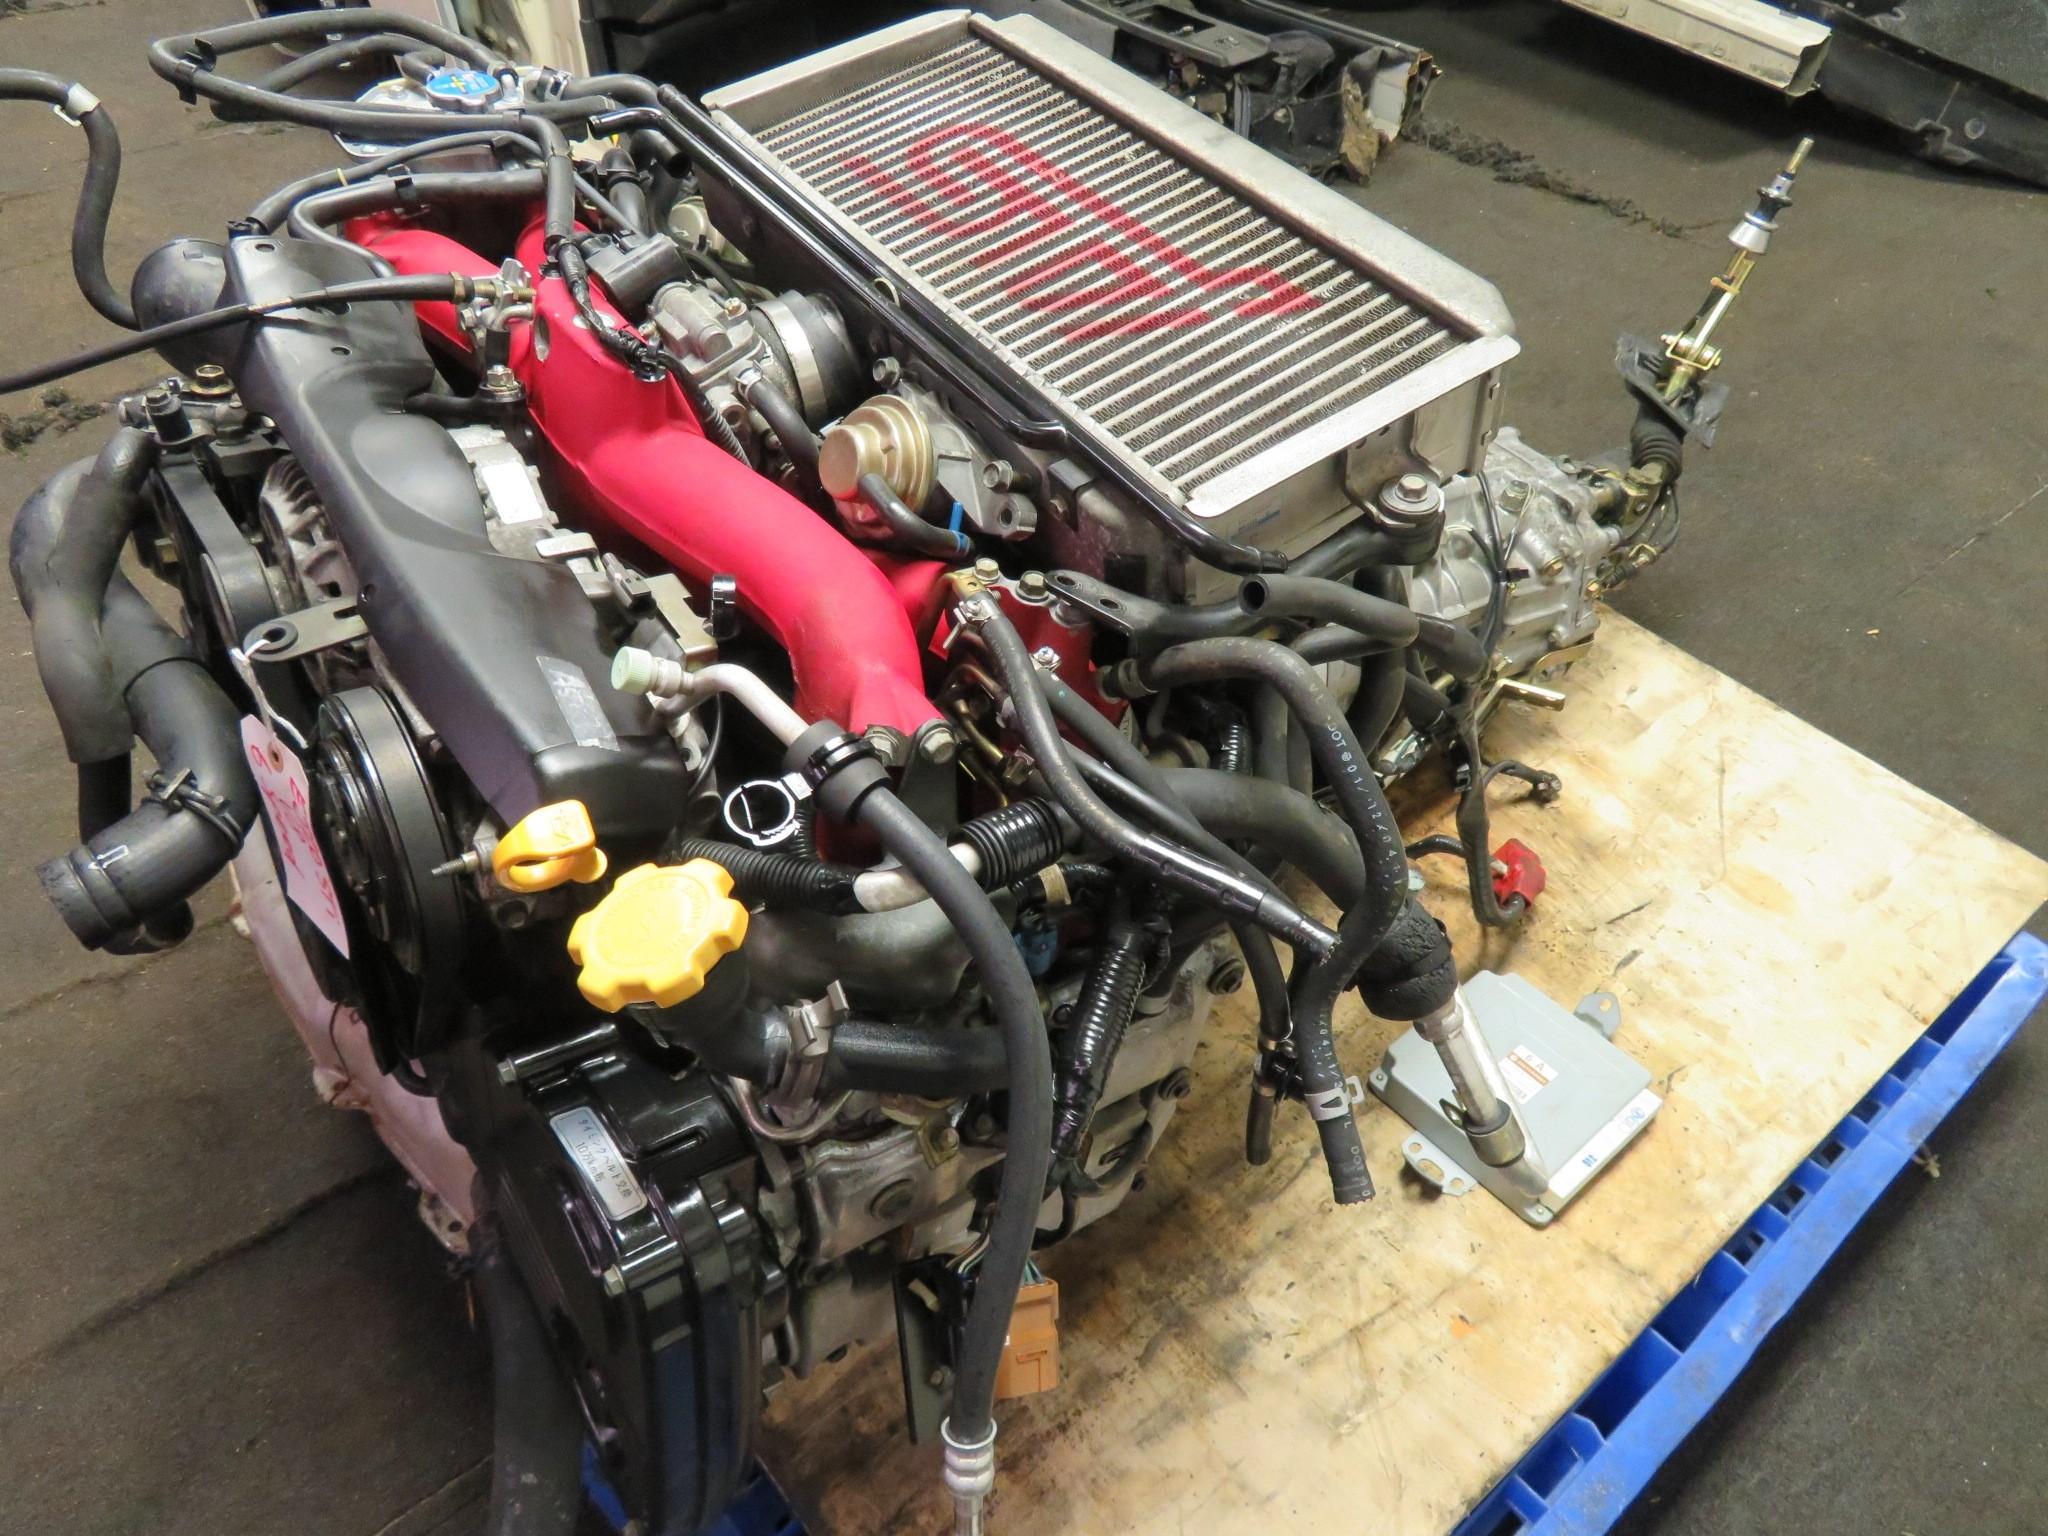 04-05 JDM SUBARU WRX STI EJ20 2.0L TURBO ENGINE, 6 SPEED TRANSMISSION, ECU VERSION 8